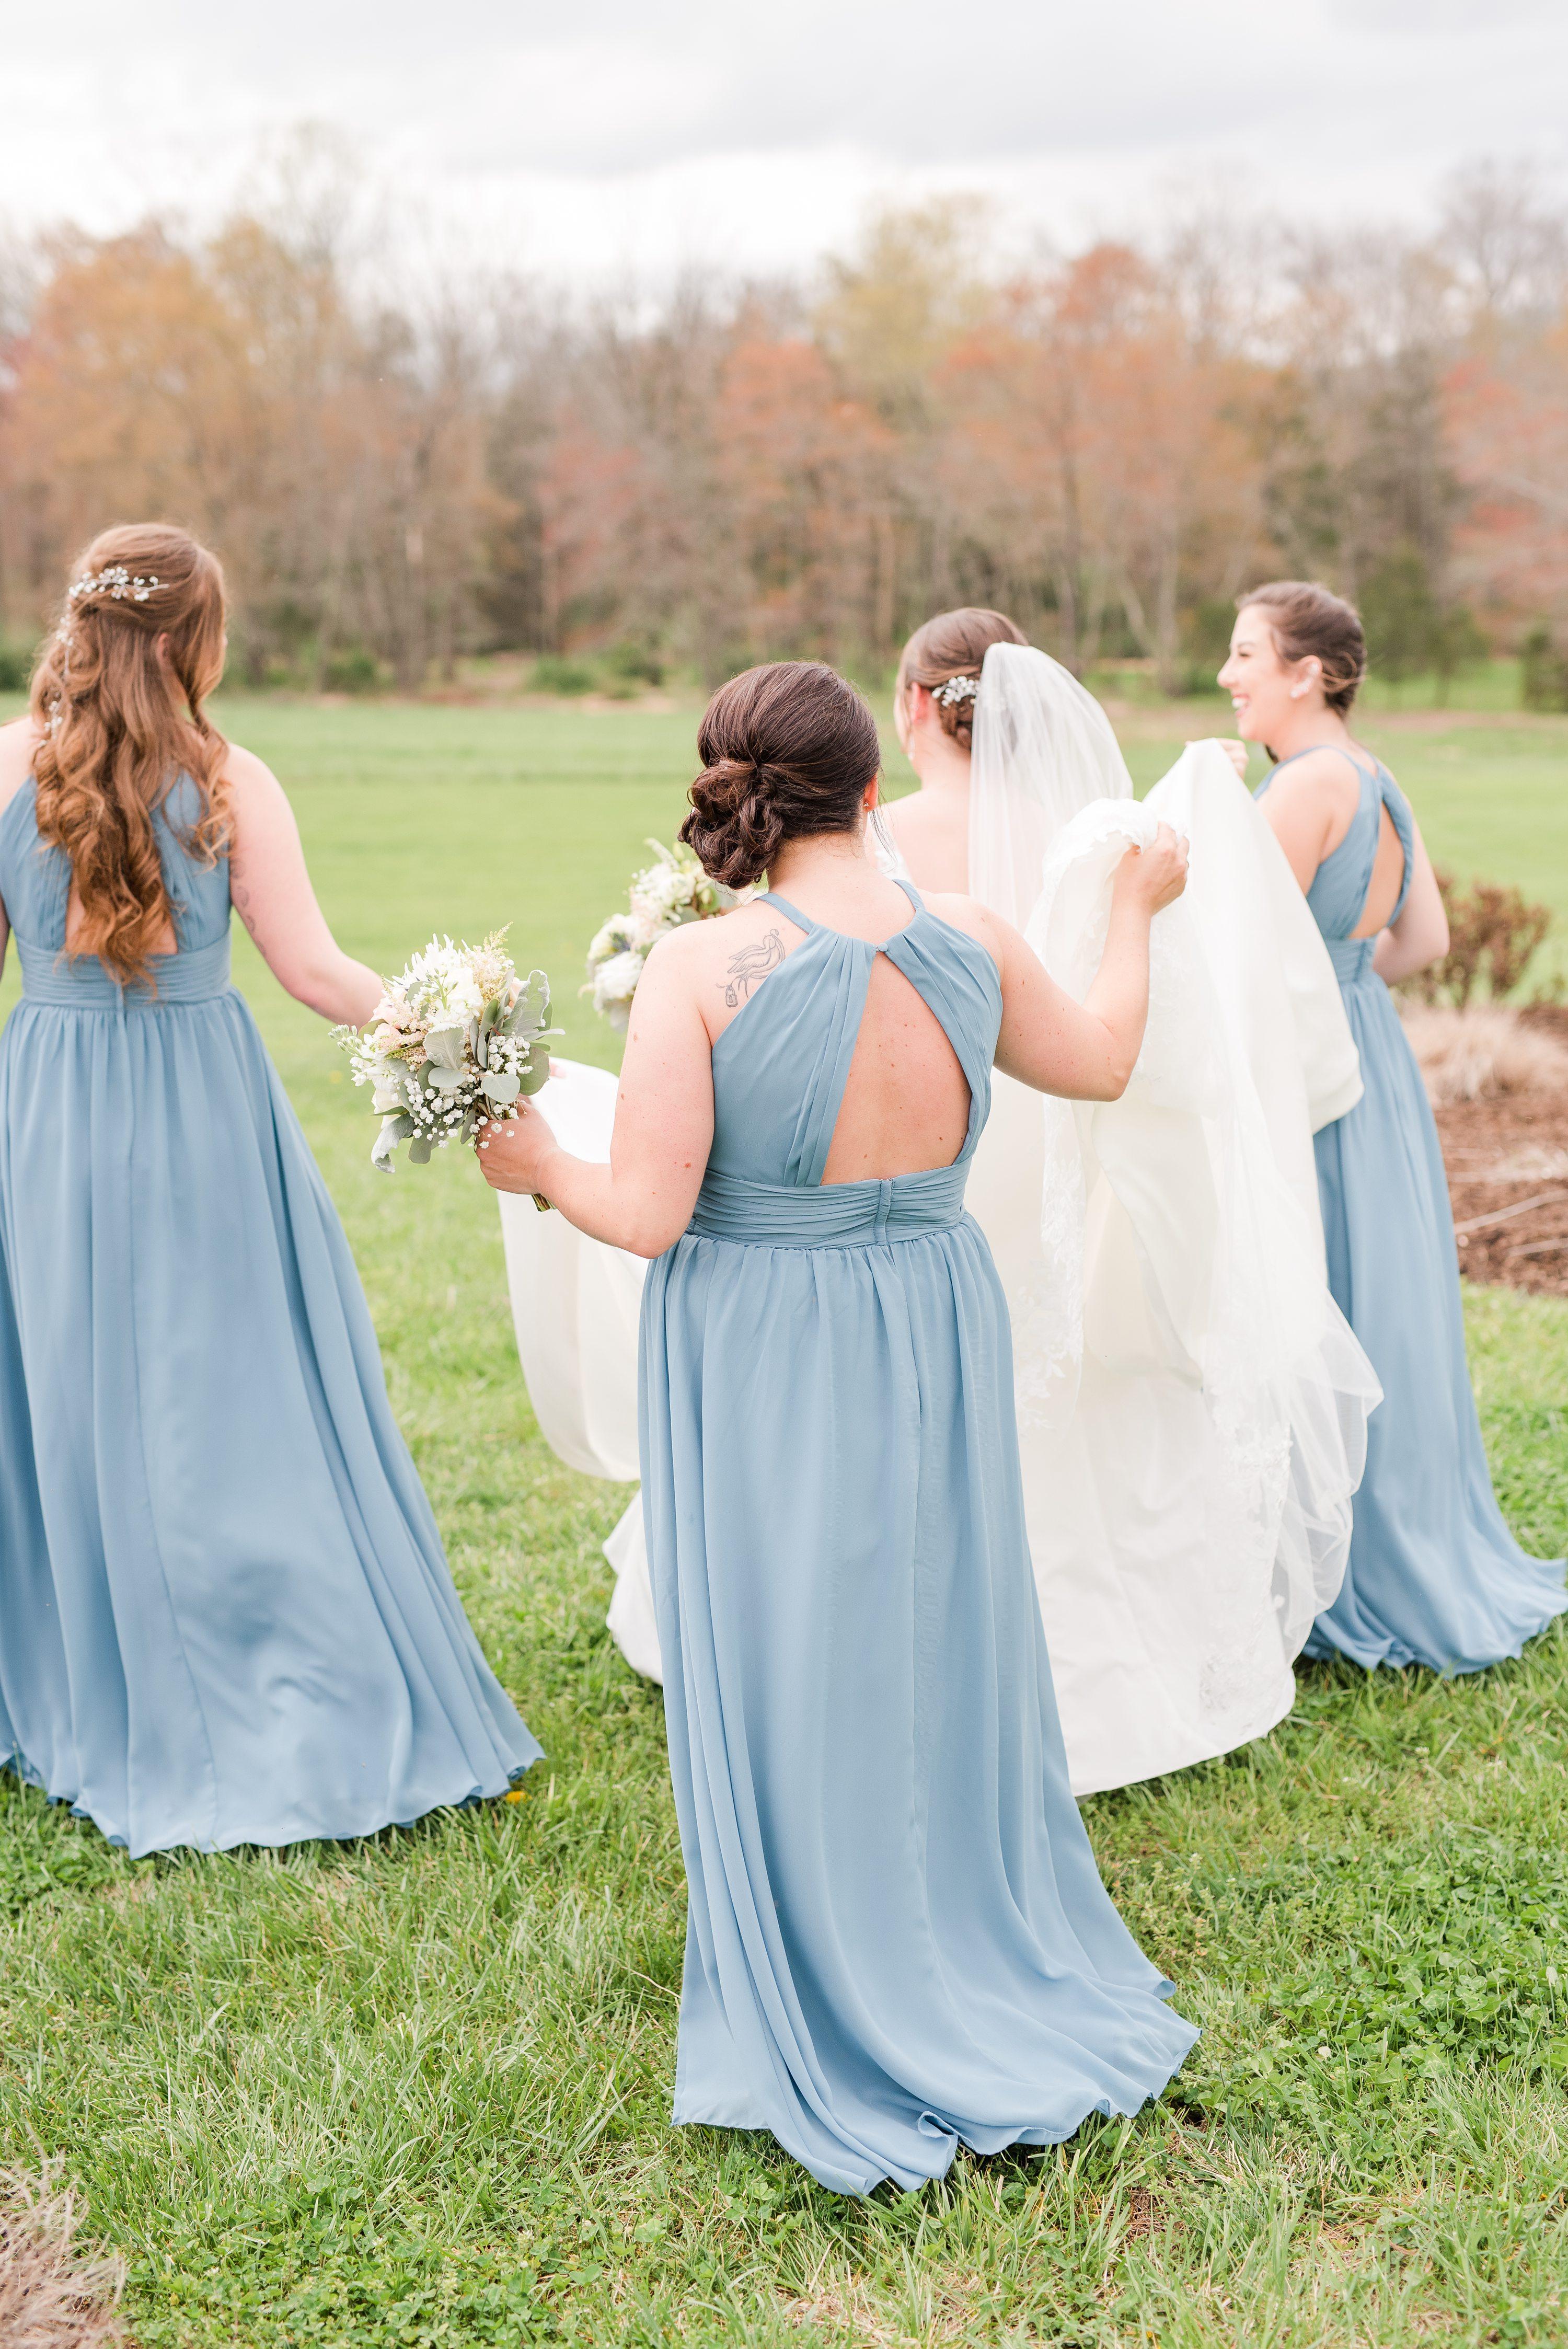 Bright,Barn at Edgewood,bride and bridesmaids,bridesmaids,bride,mountain wedding